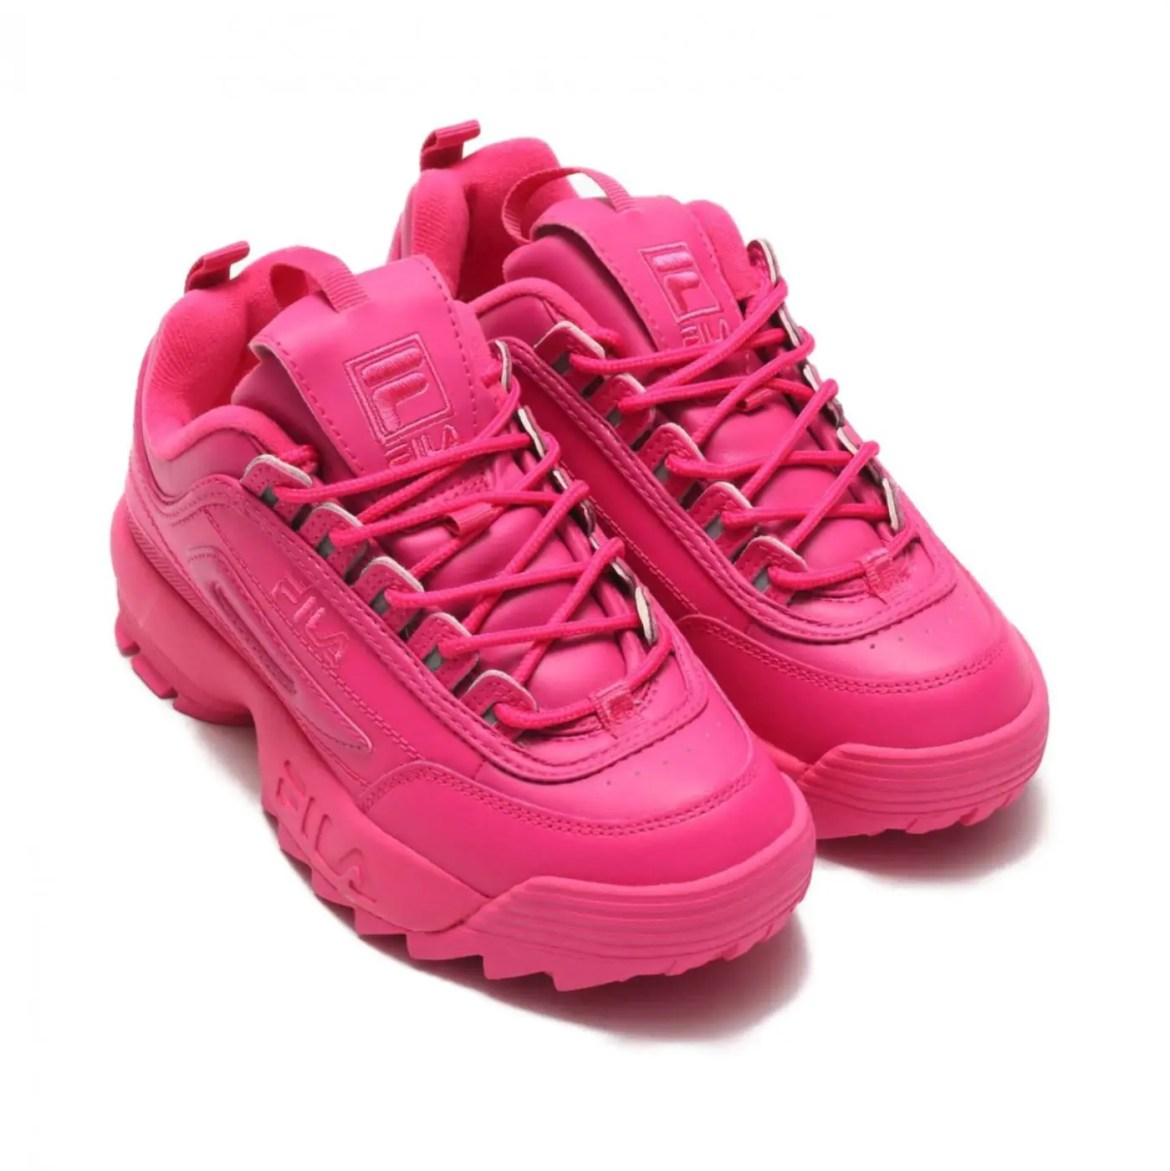 FILA Disruptor 2 Mono Neon Sneaker-14